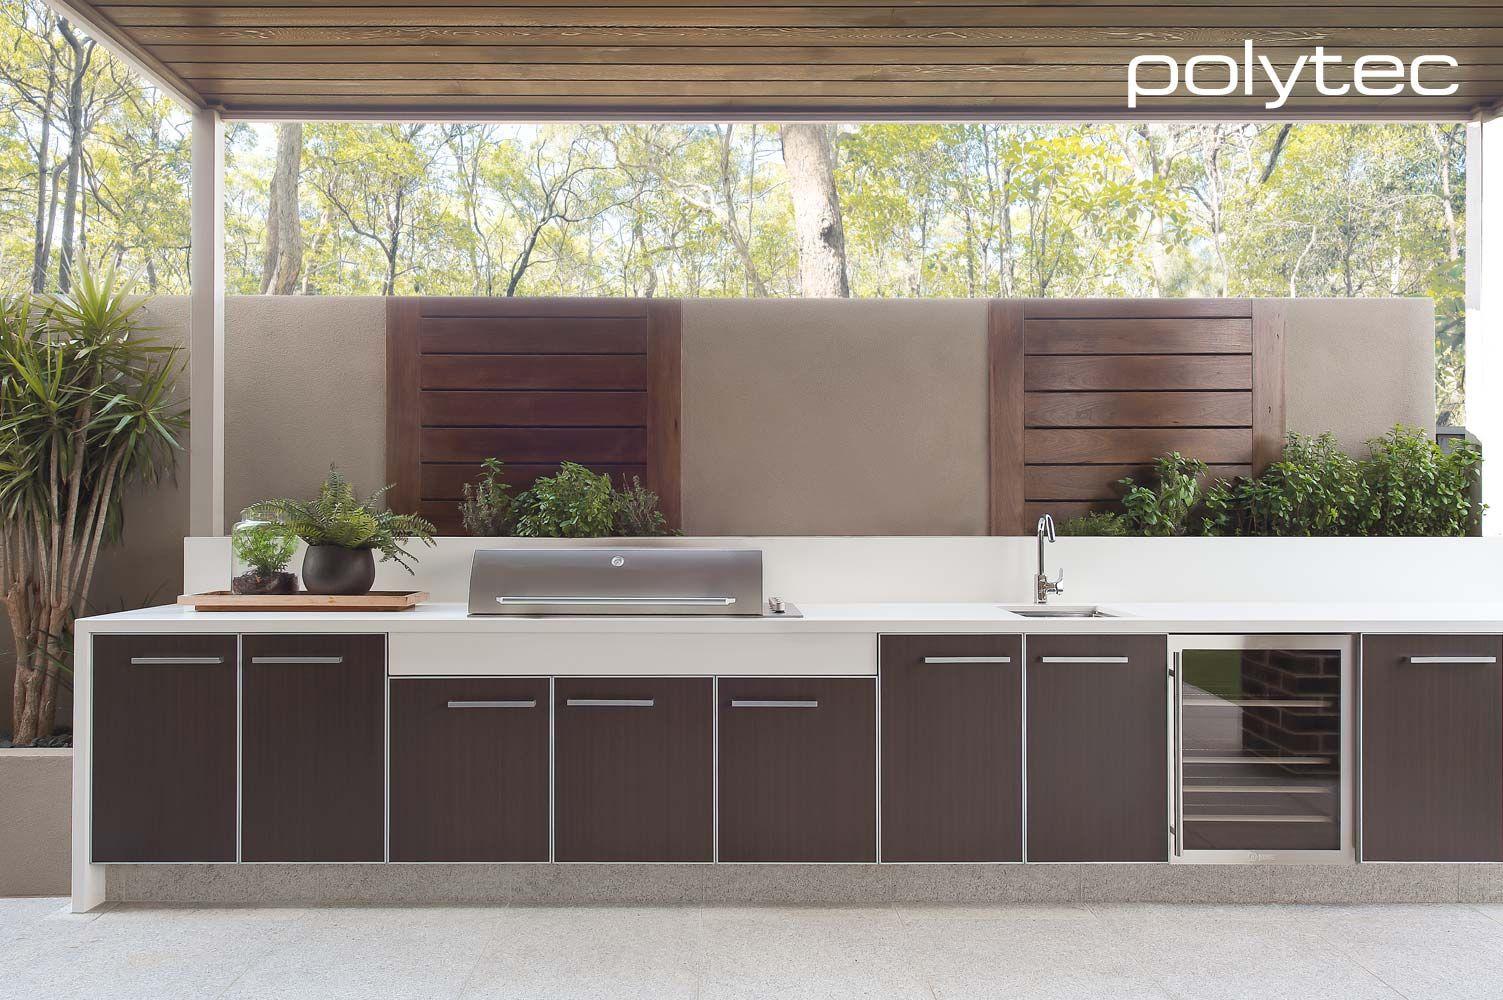 Doors In Aluminium 5mm 55mm Satin Alumunium Frame With Belgian Oak Compact Outdoor Kitchen Design Outdoor Bbq Kitchen Outdoor Barbeque